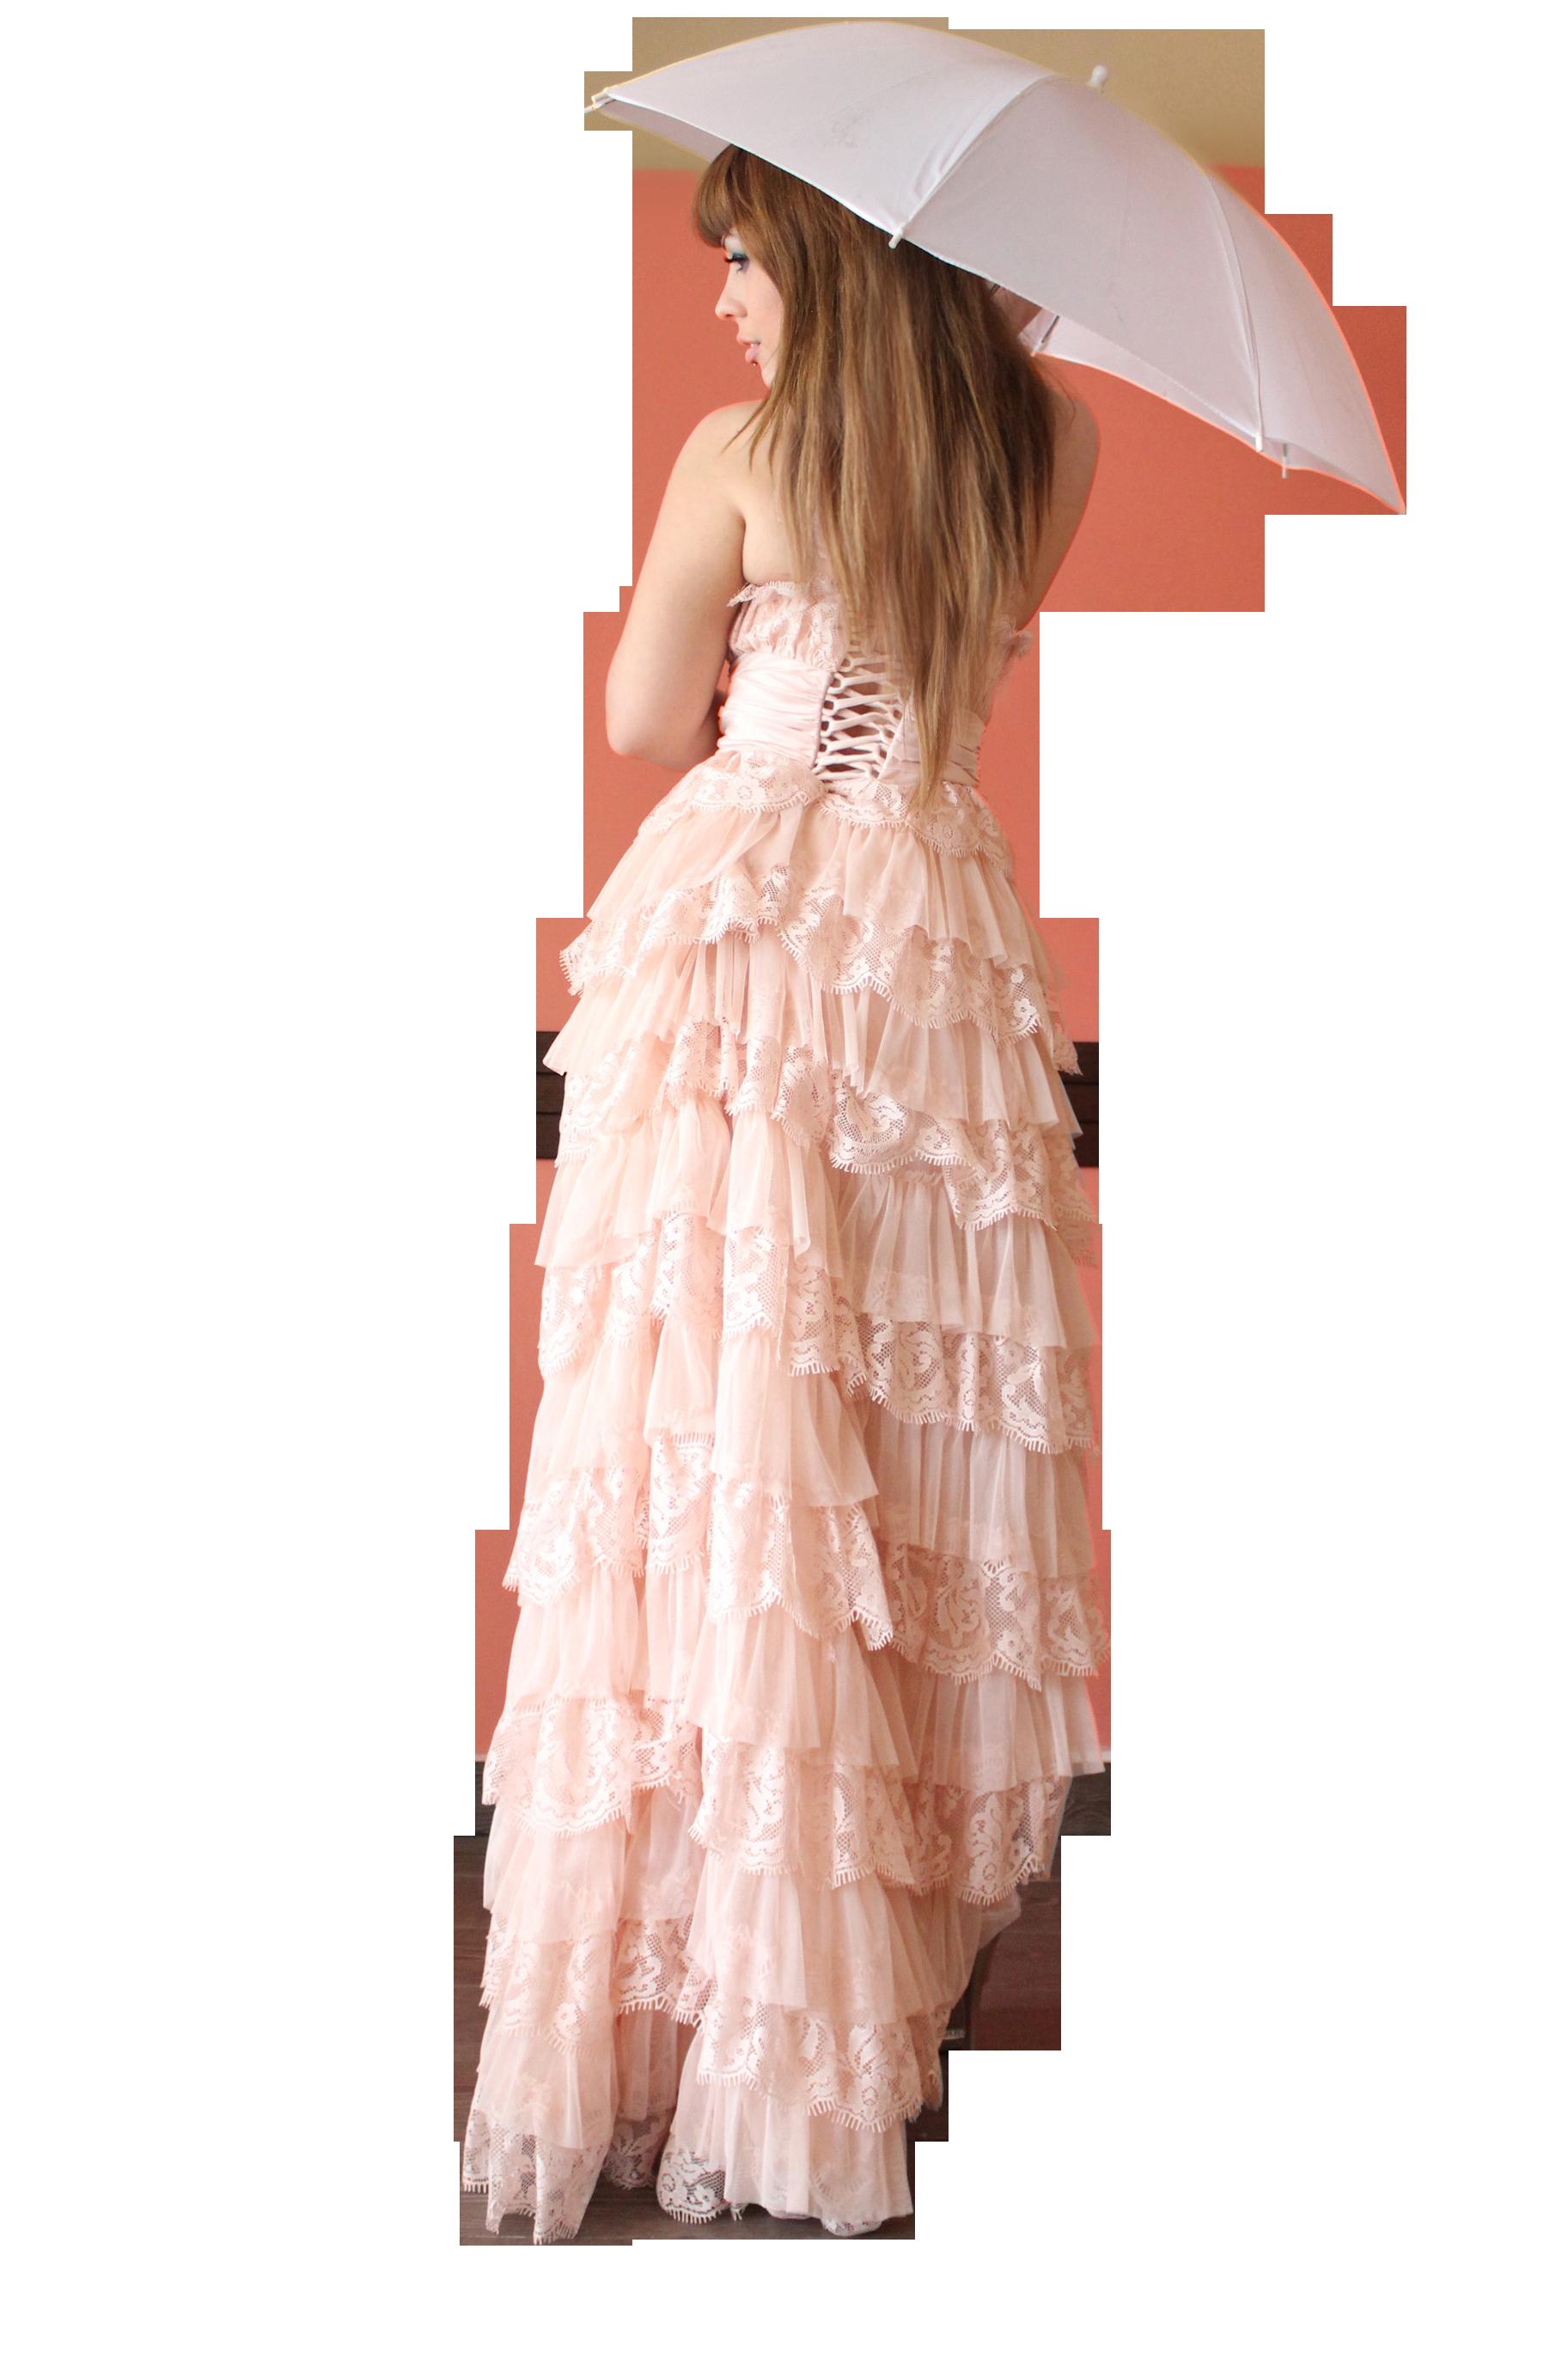 Deviantart color clip art. Clothing clipart pink dress